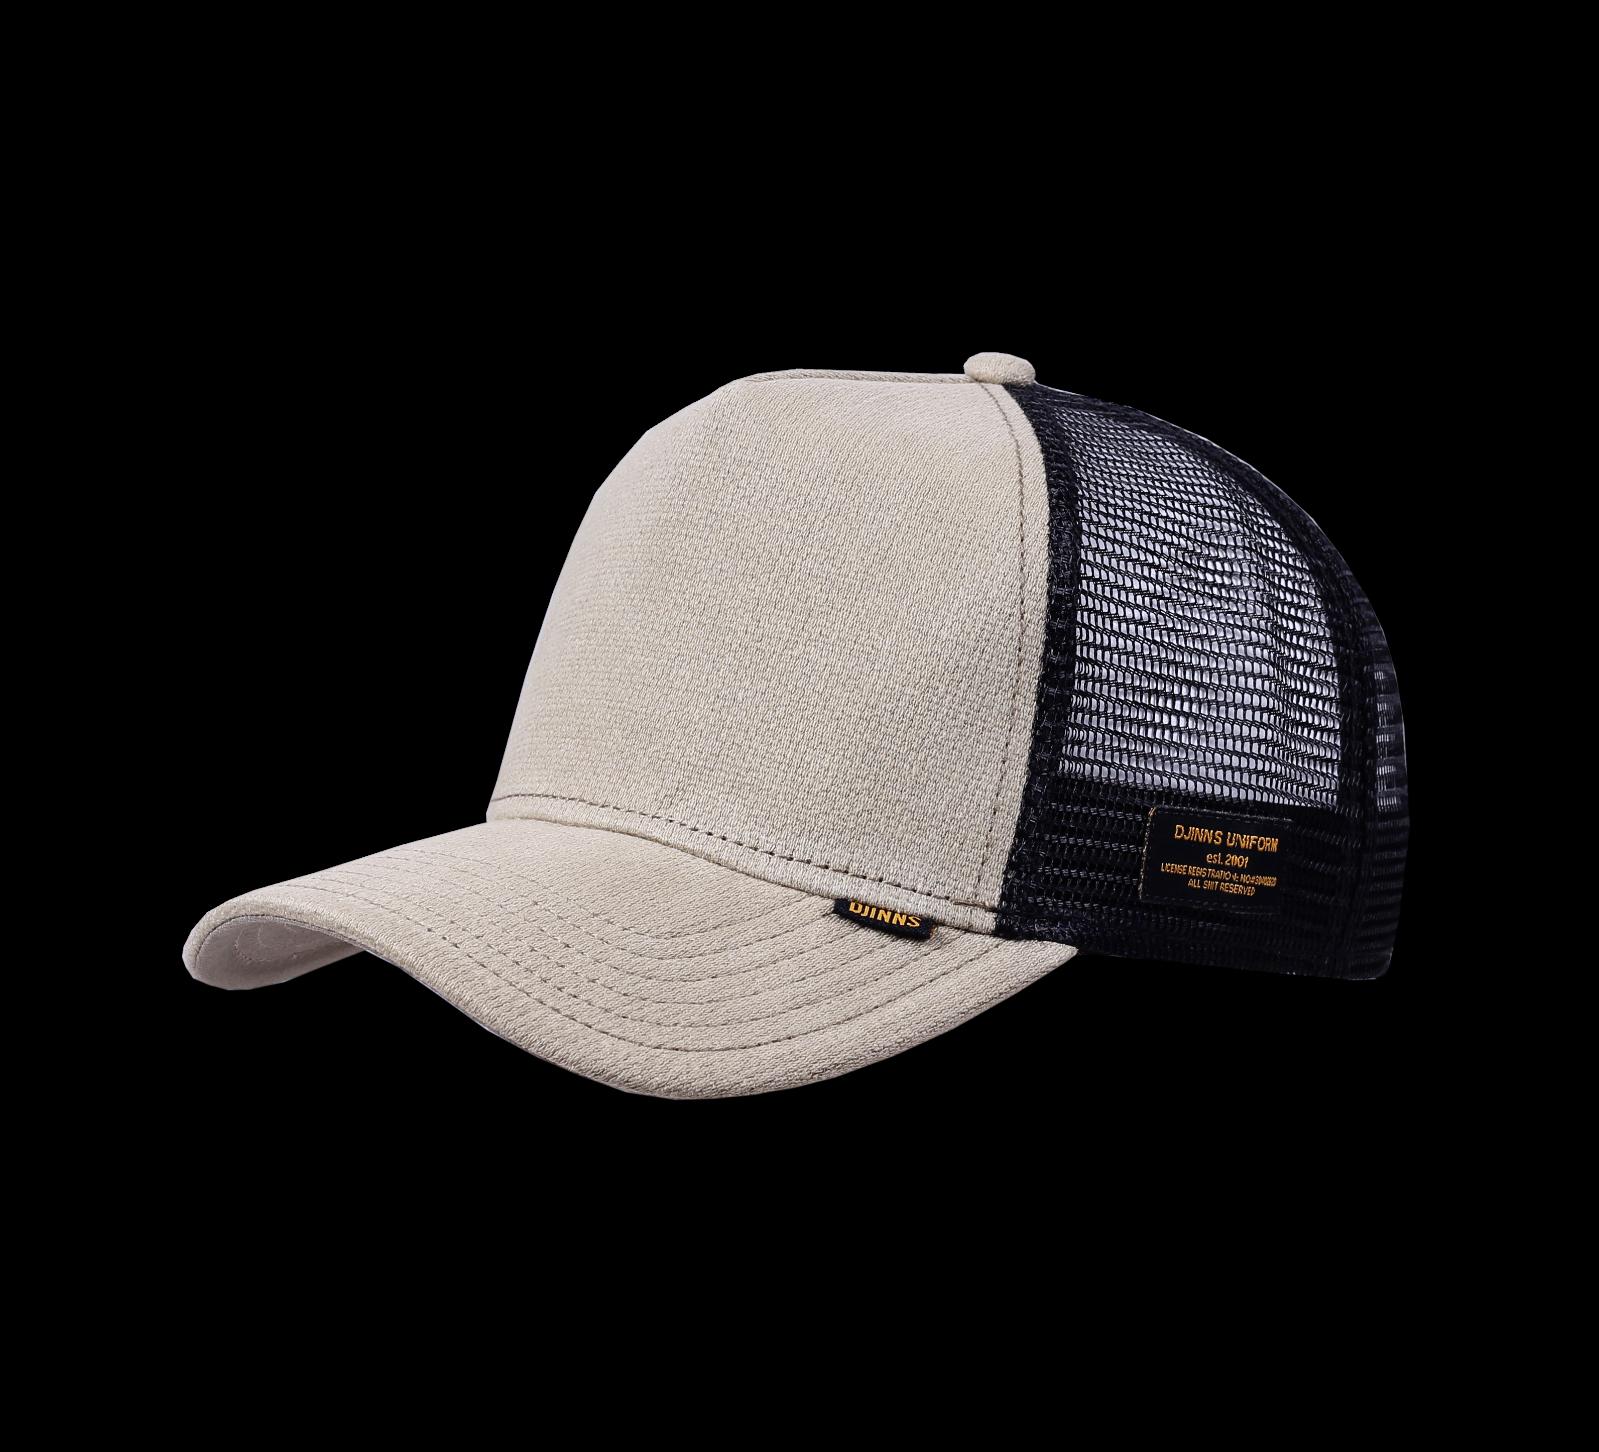 Djinns Hft Cap Full Bubble Piqué High Fit Trucker Basecap Snapback Curved Hat